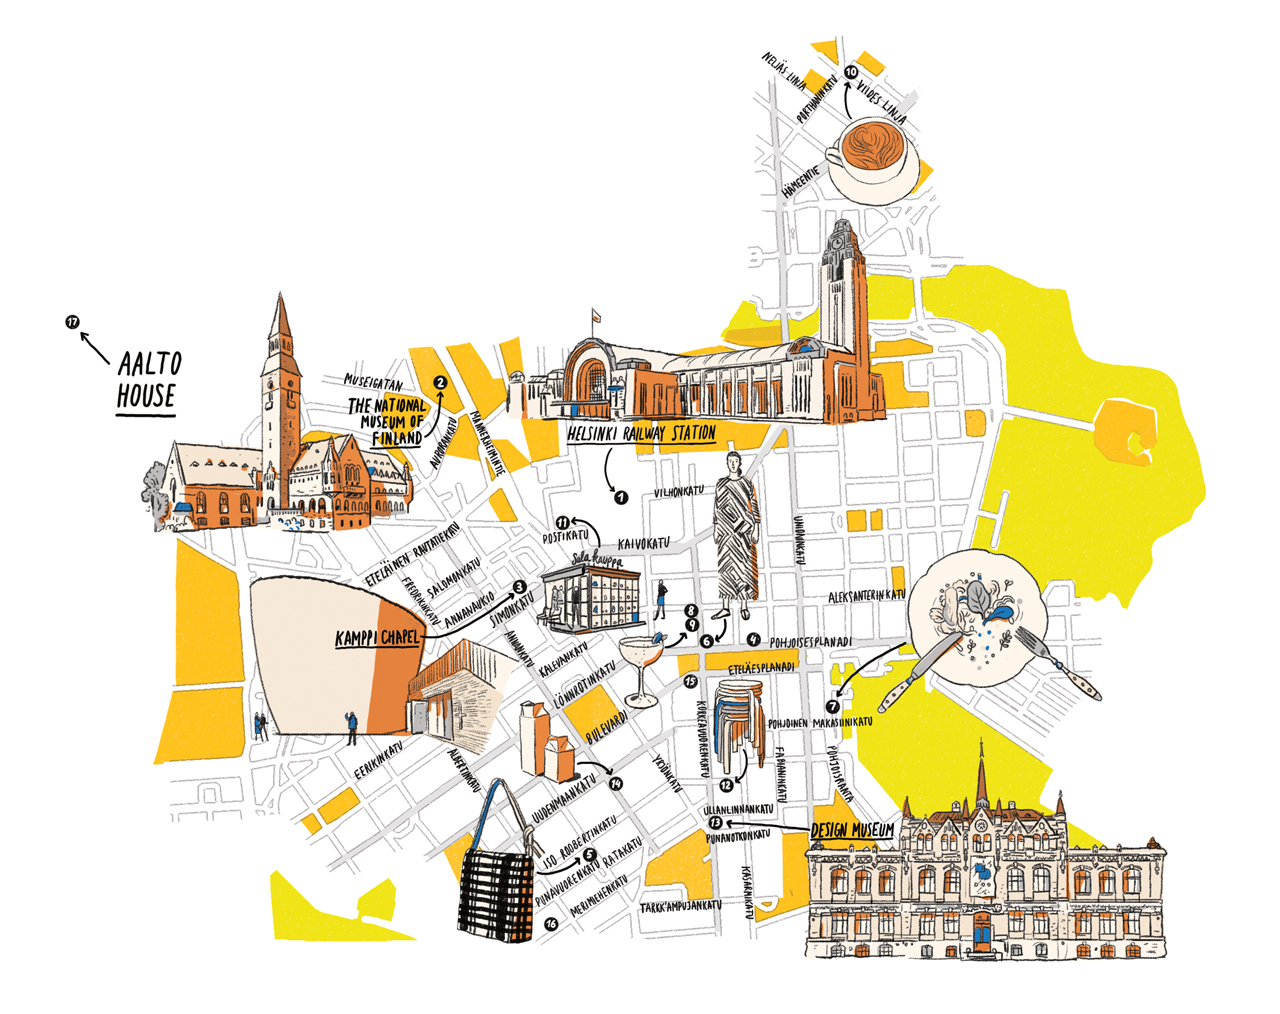 A guide to Helsinki